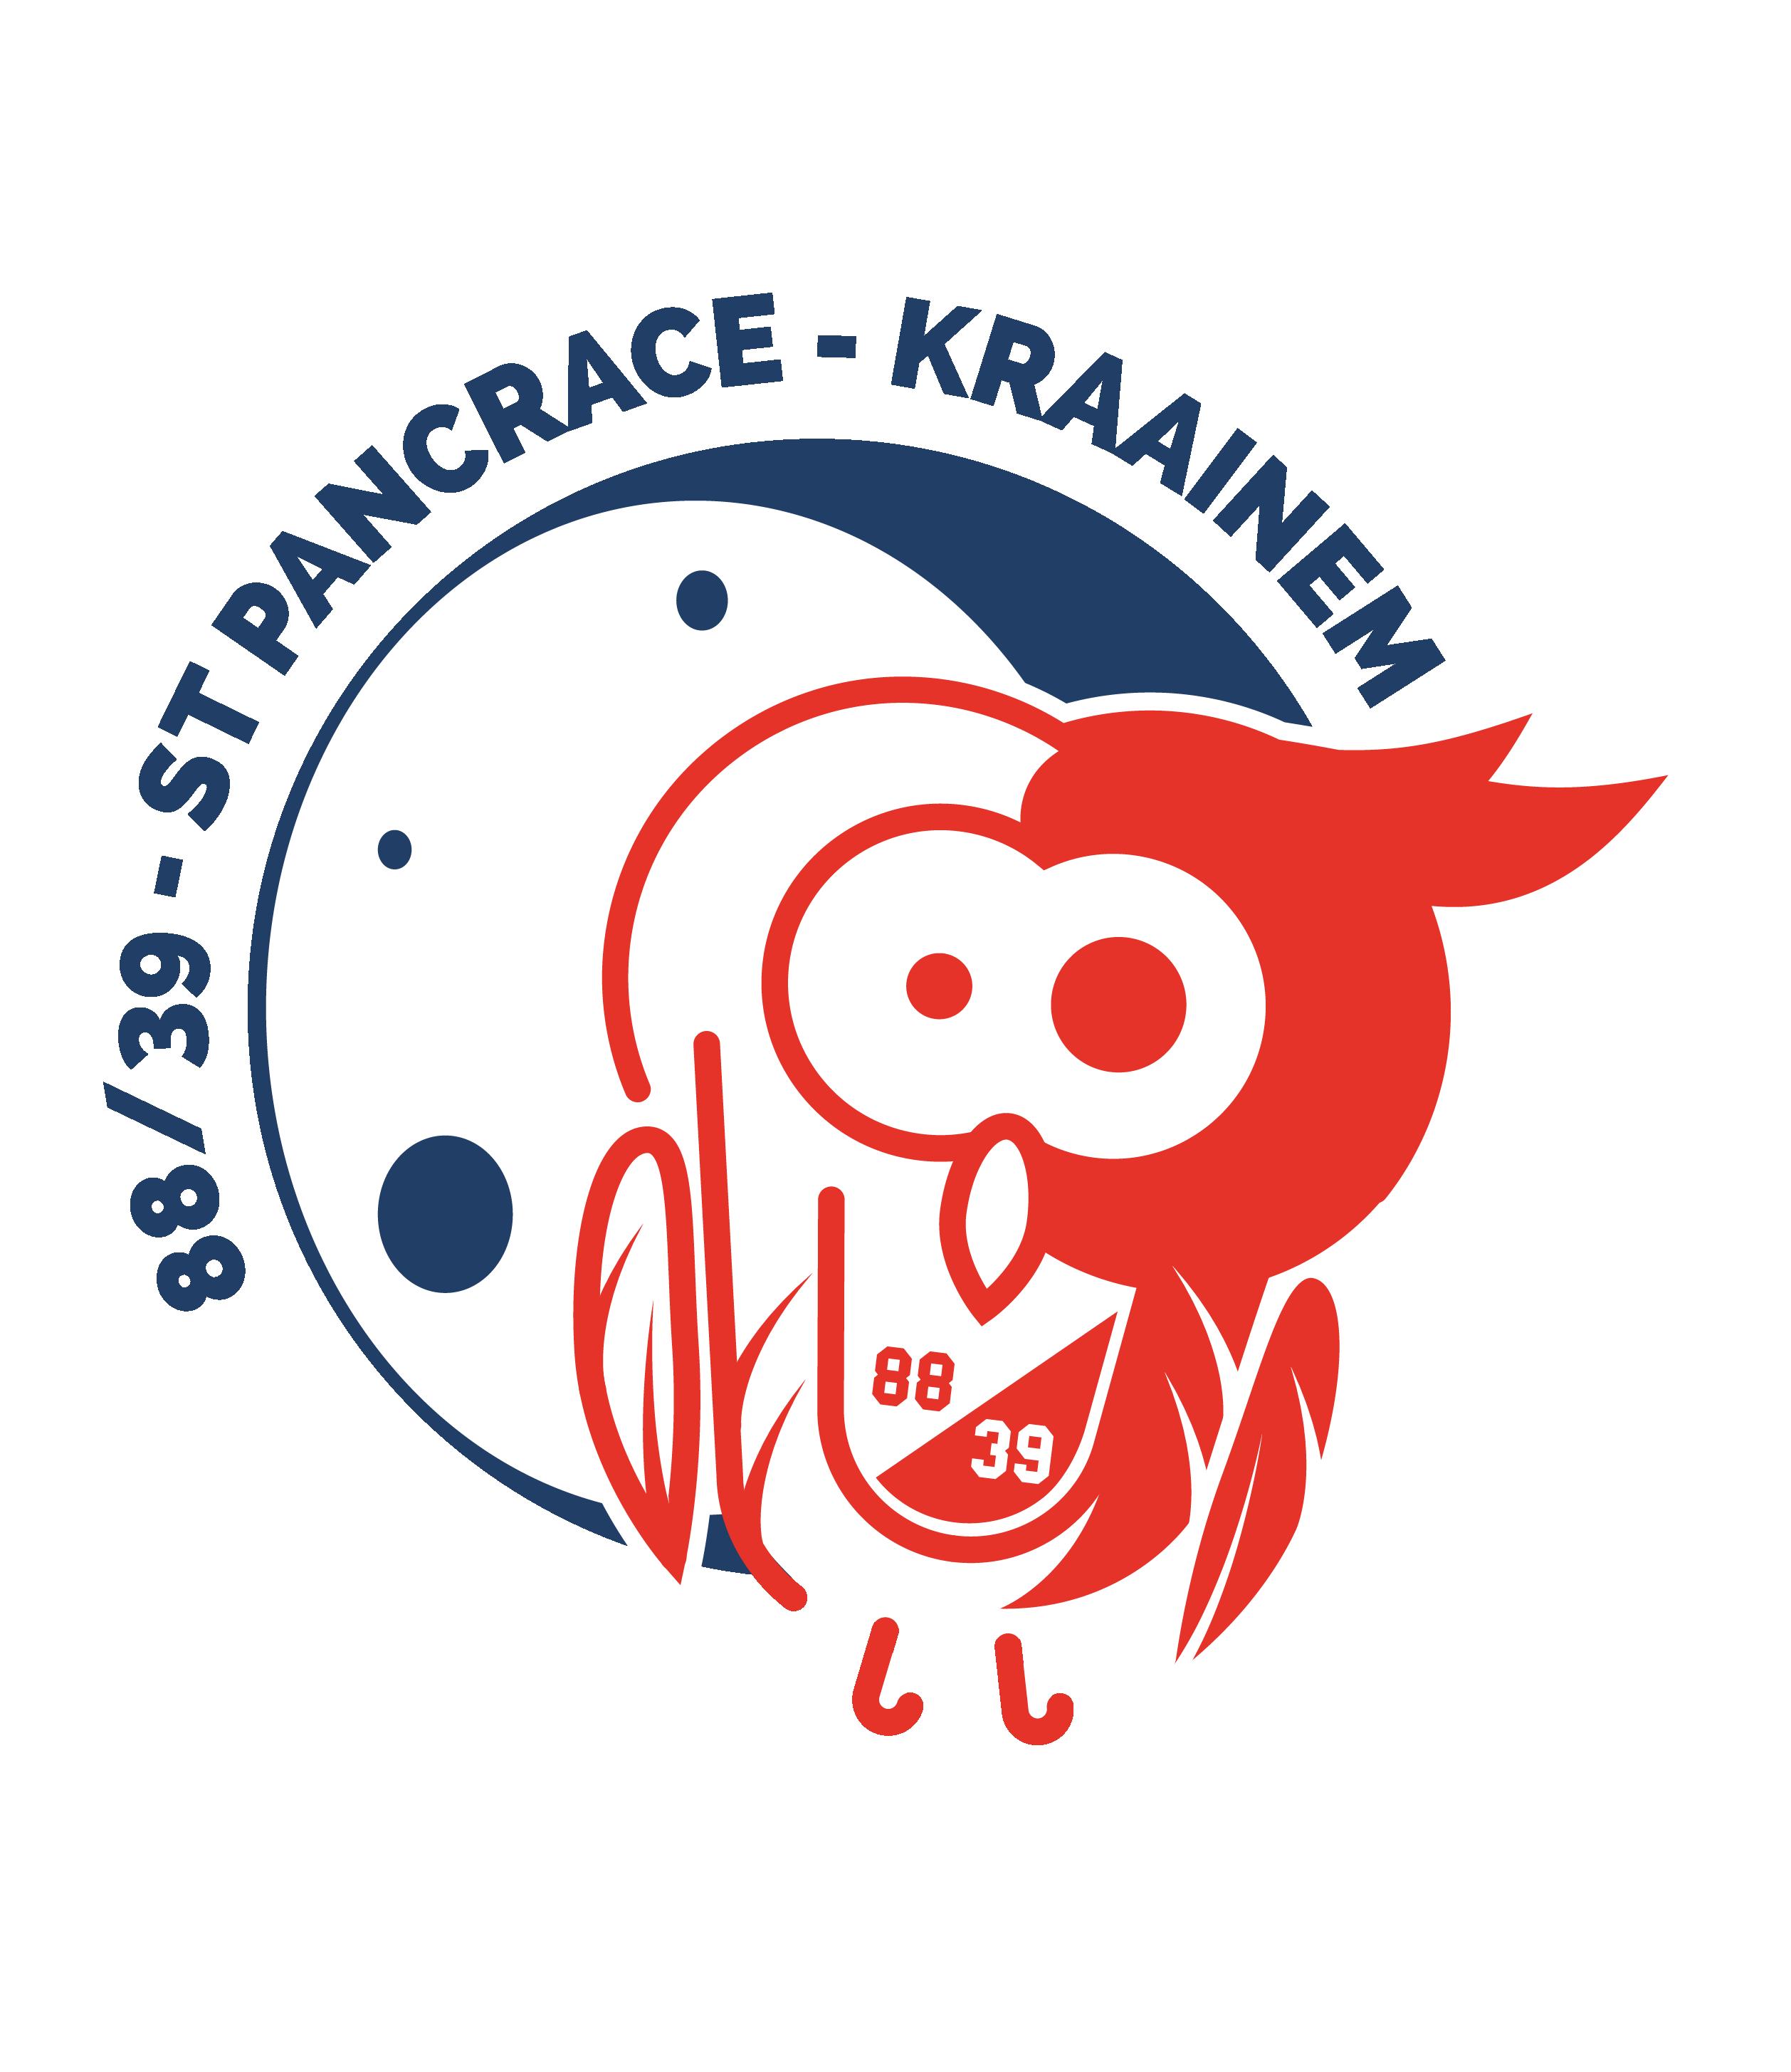 Unités39-88Kraainem